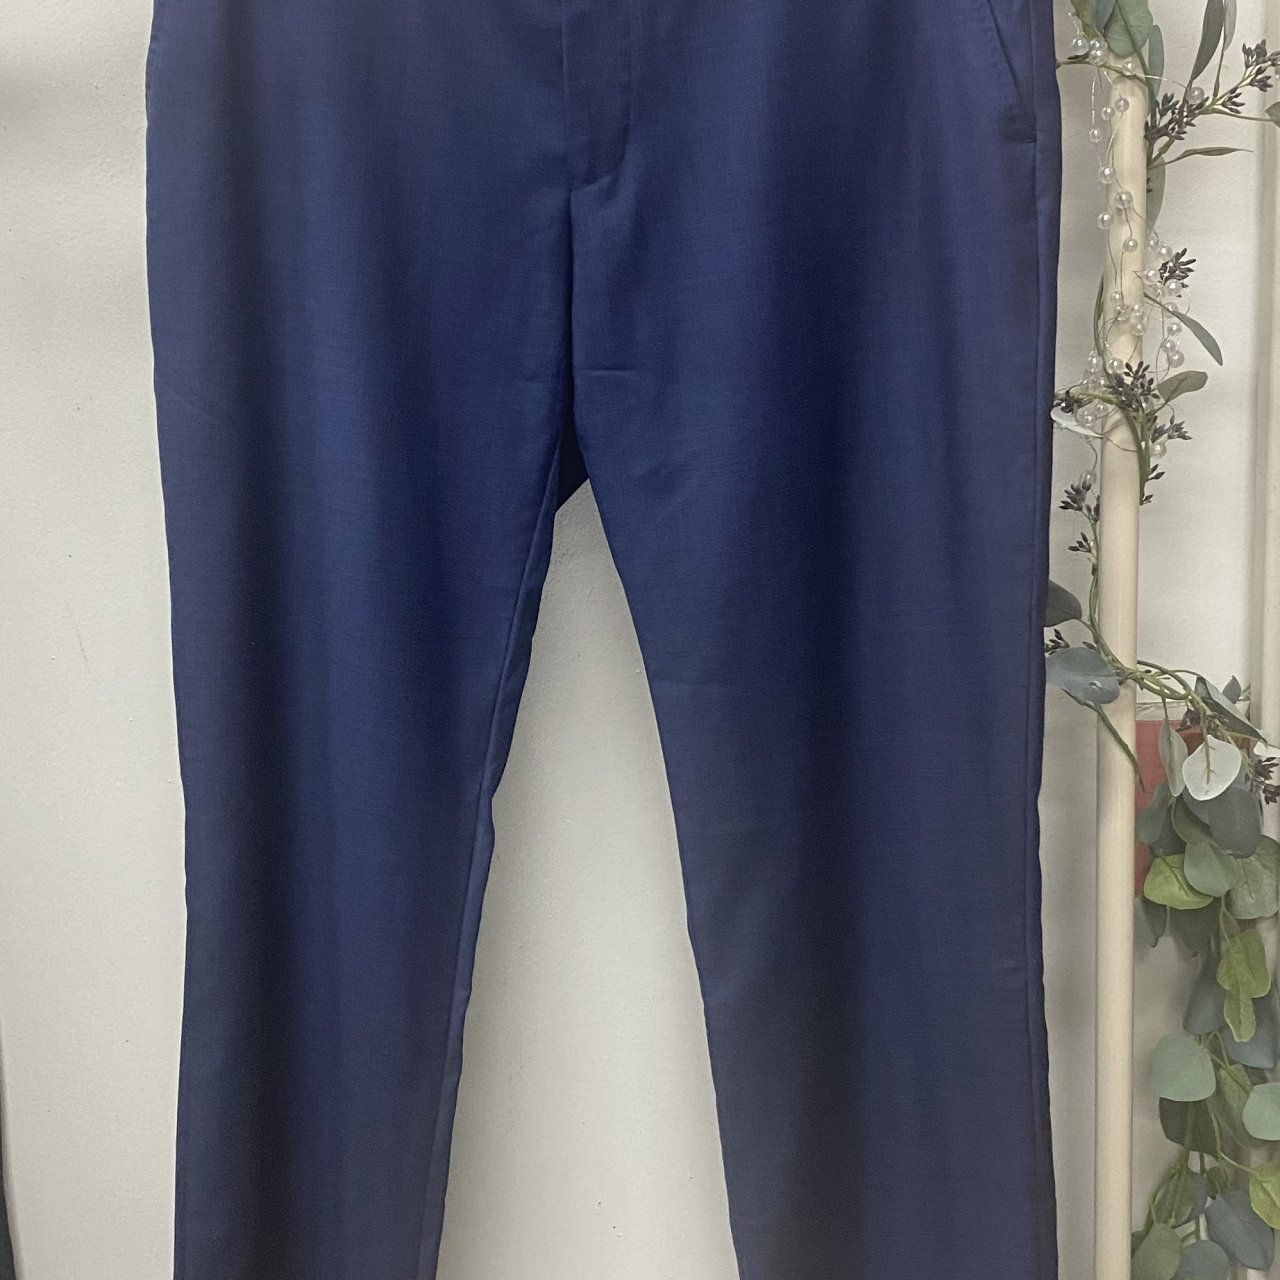 Wayne Cooper Mens Wool Dress Pants Size 34